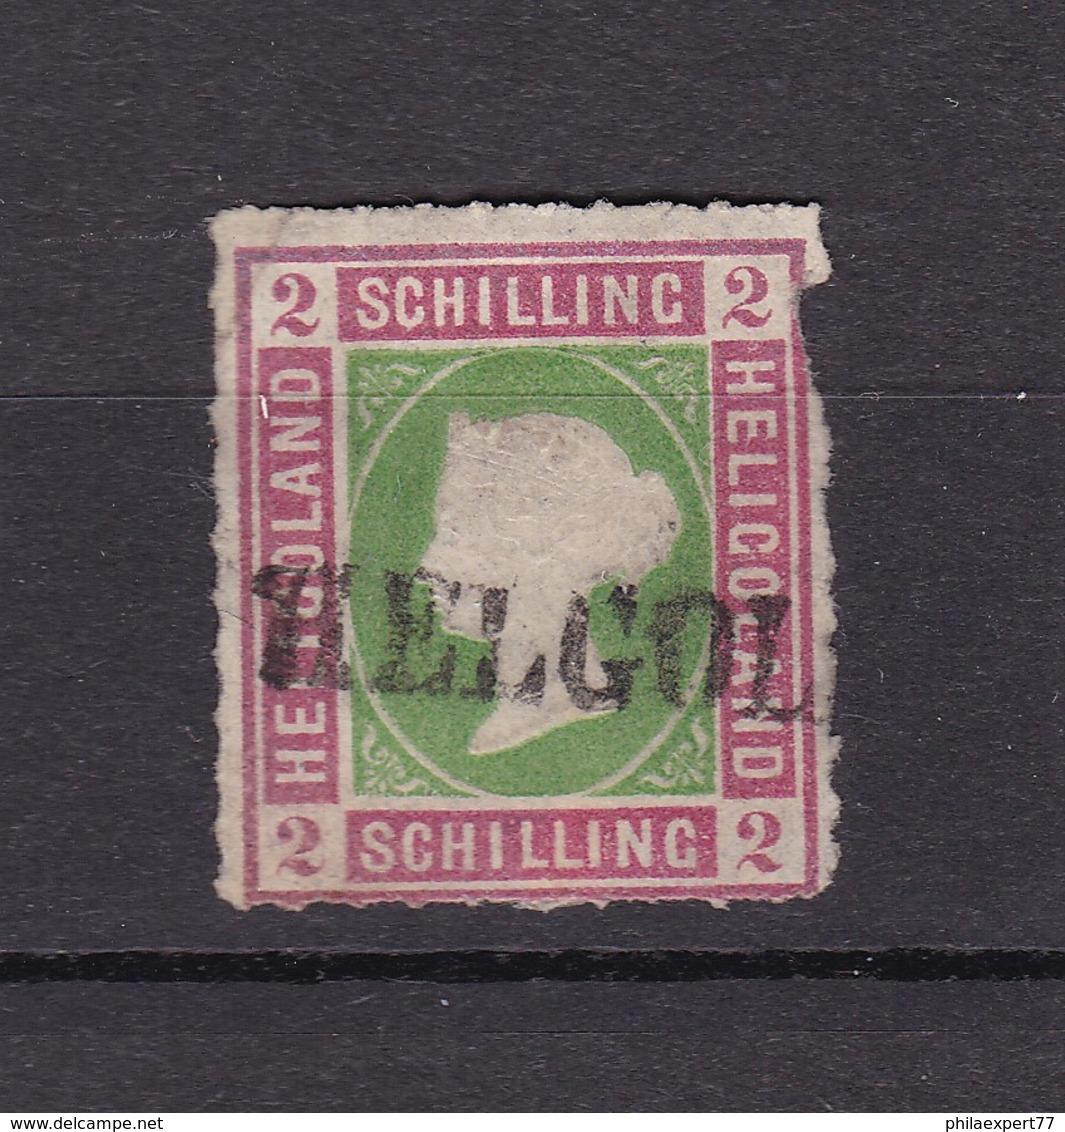 Helgoland - 1867 - Michel Nr. 3 - Gestempelt - 70 Euro - Helgoland